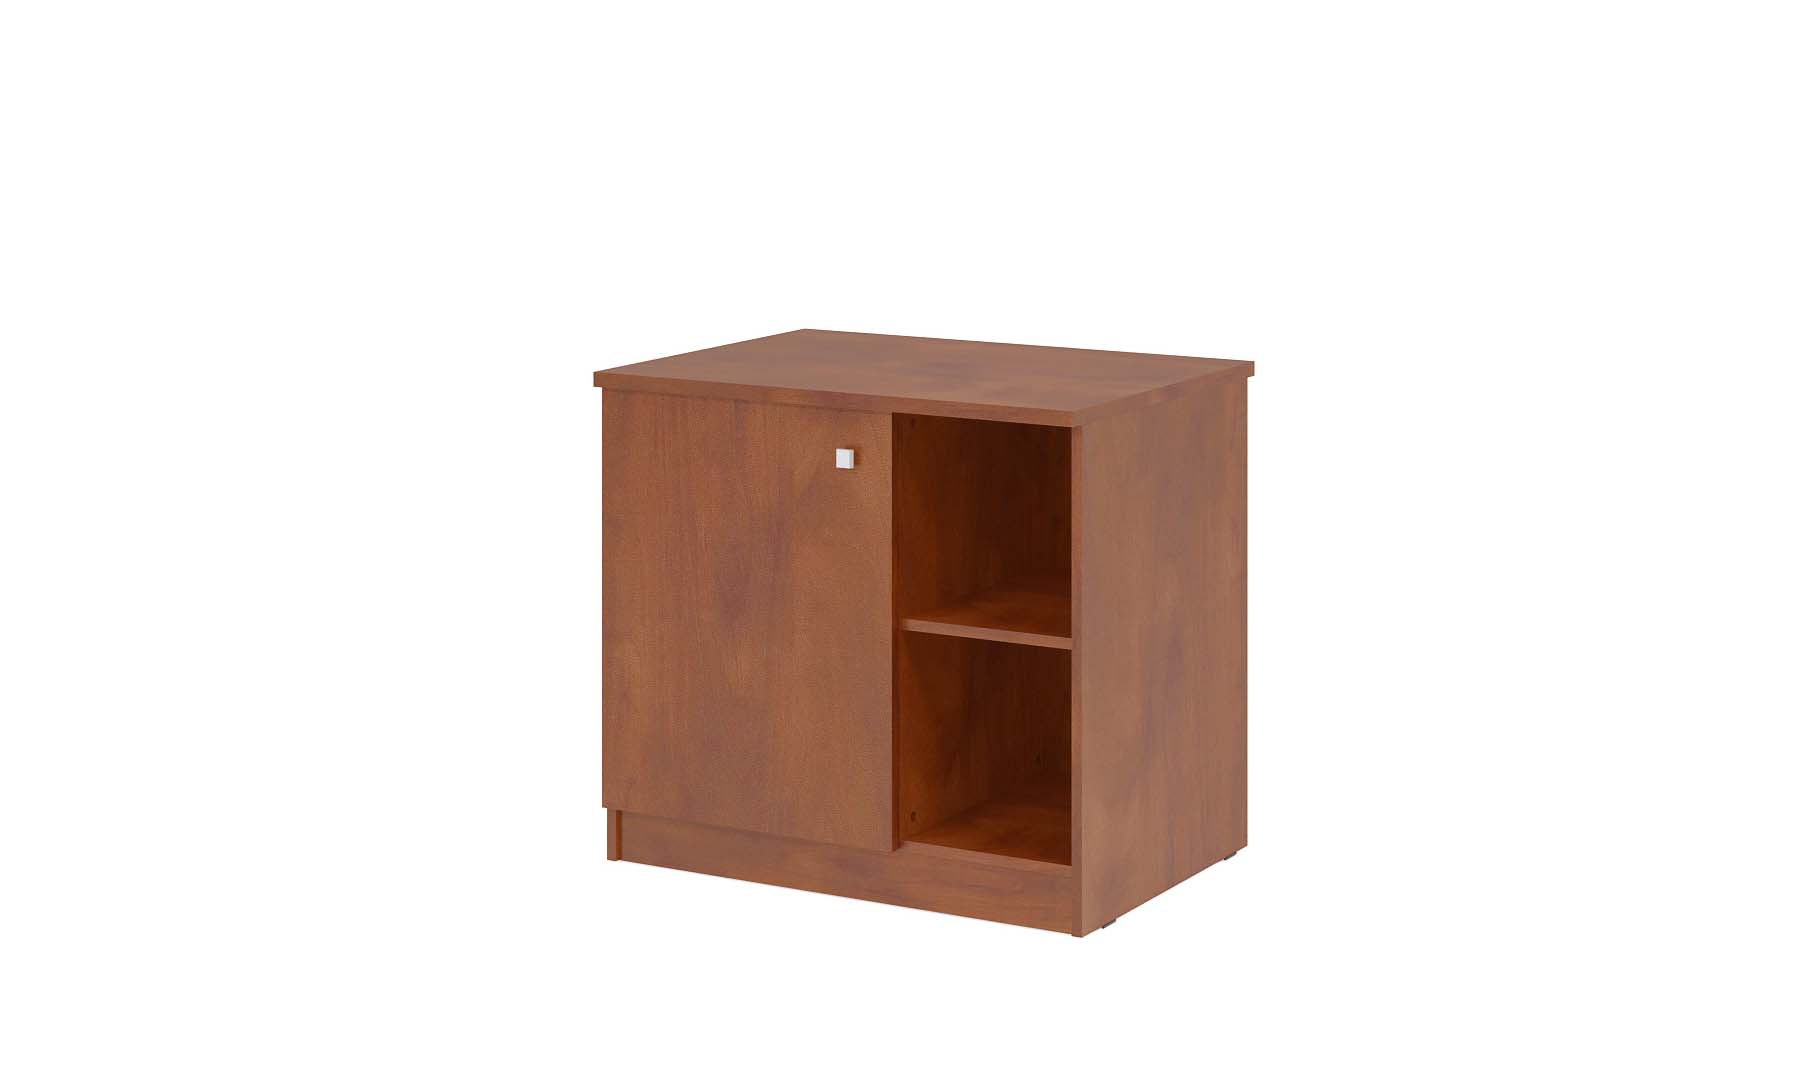 Minibar Kühlschrank Polar : Minibar kühlschrank geheimversteck minibar minikühlschrank 17l 50w